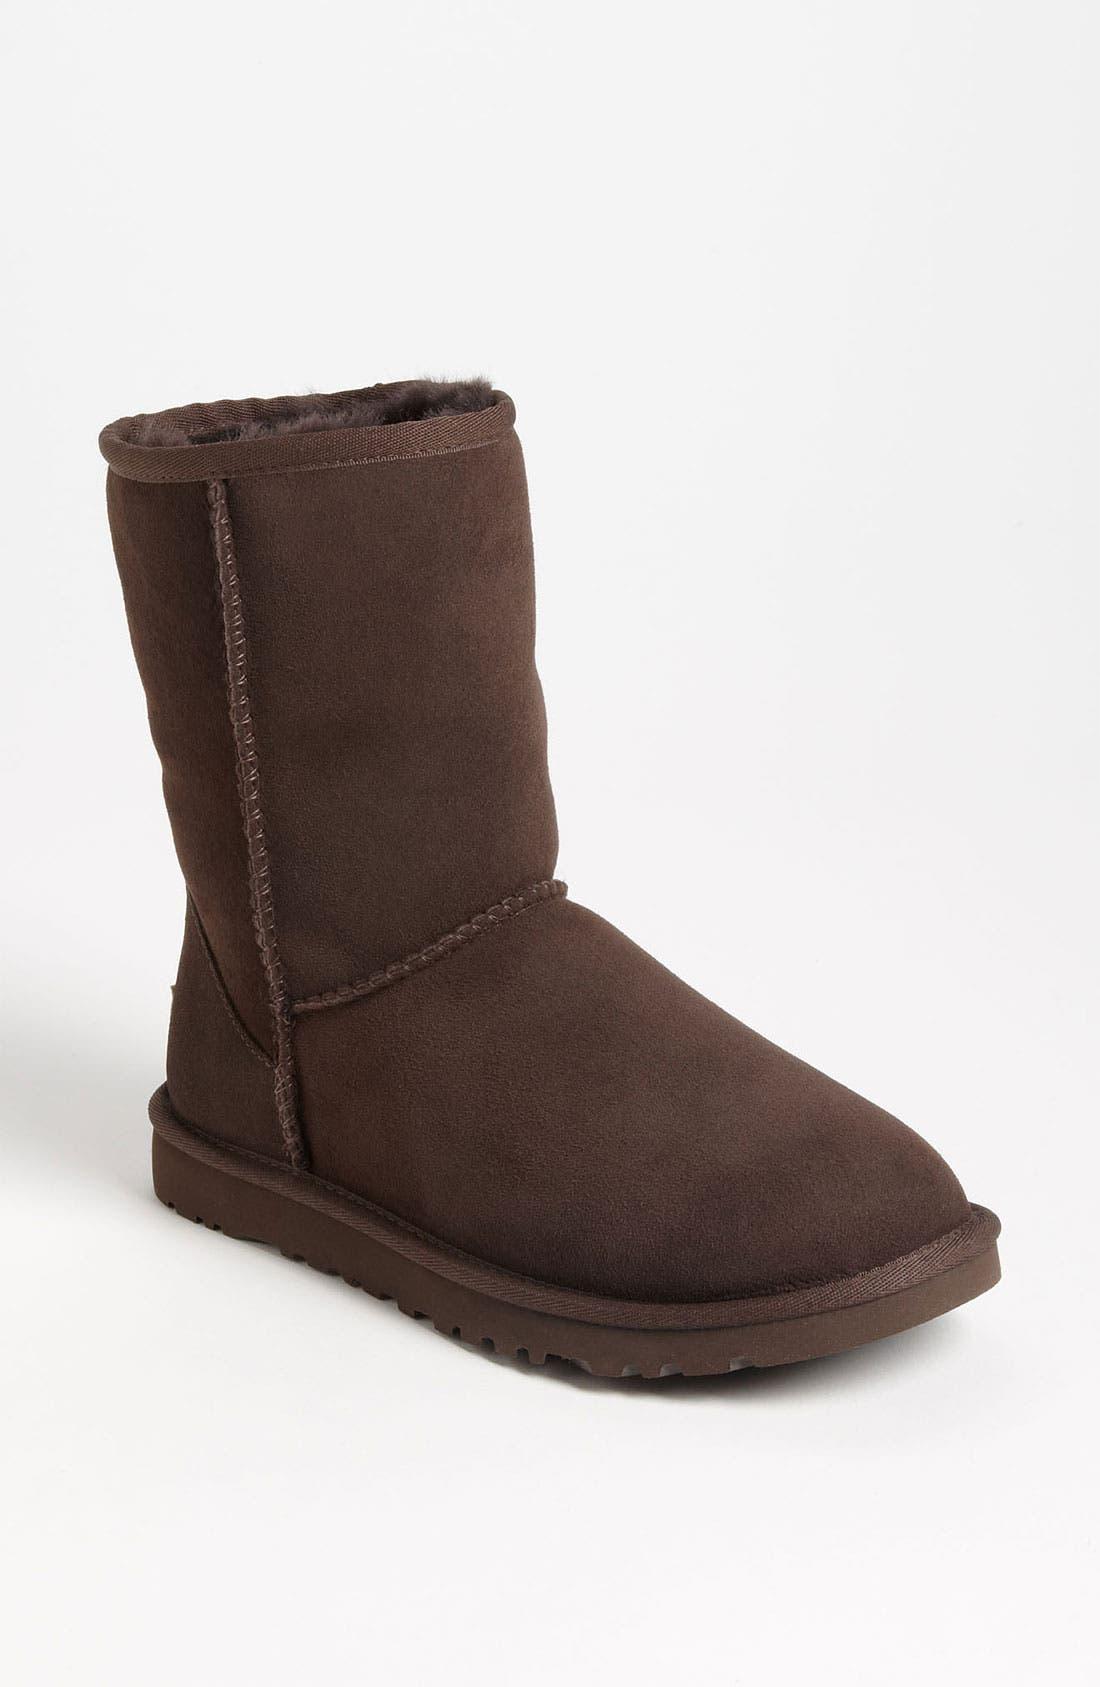 Alternate Image 1 Selected - UGG® 'Classic Short' Boot (Women)